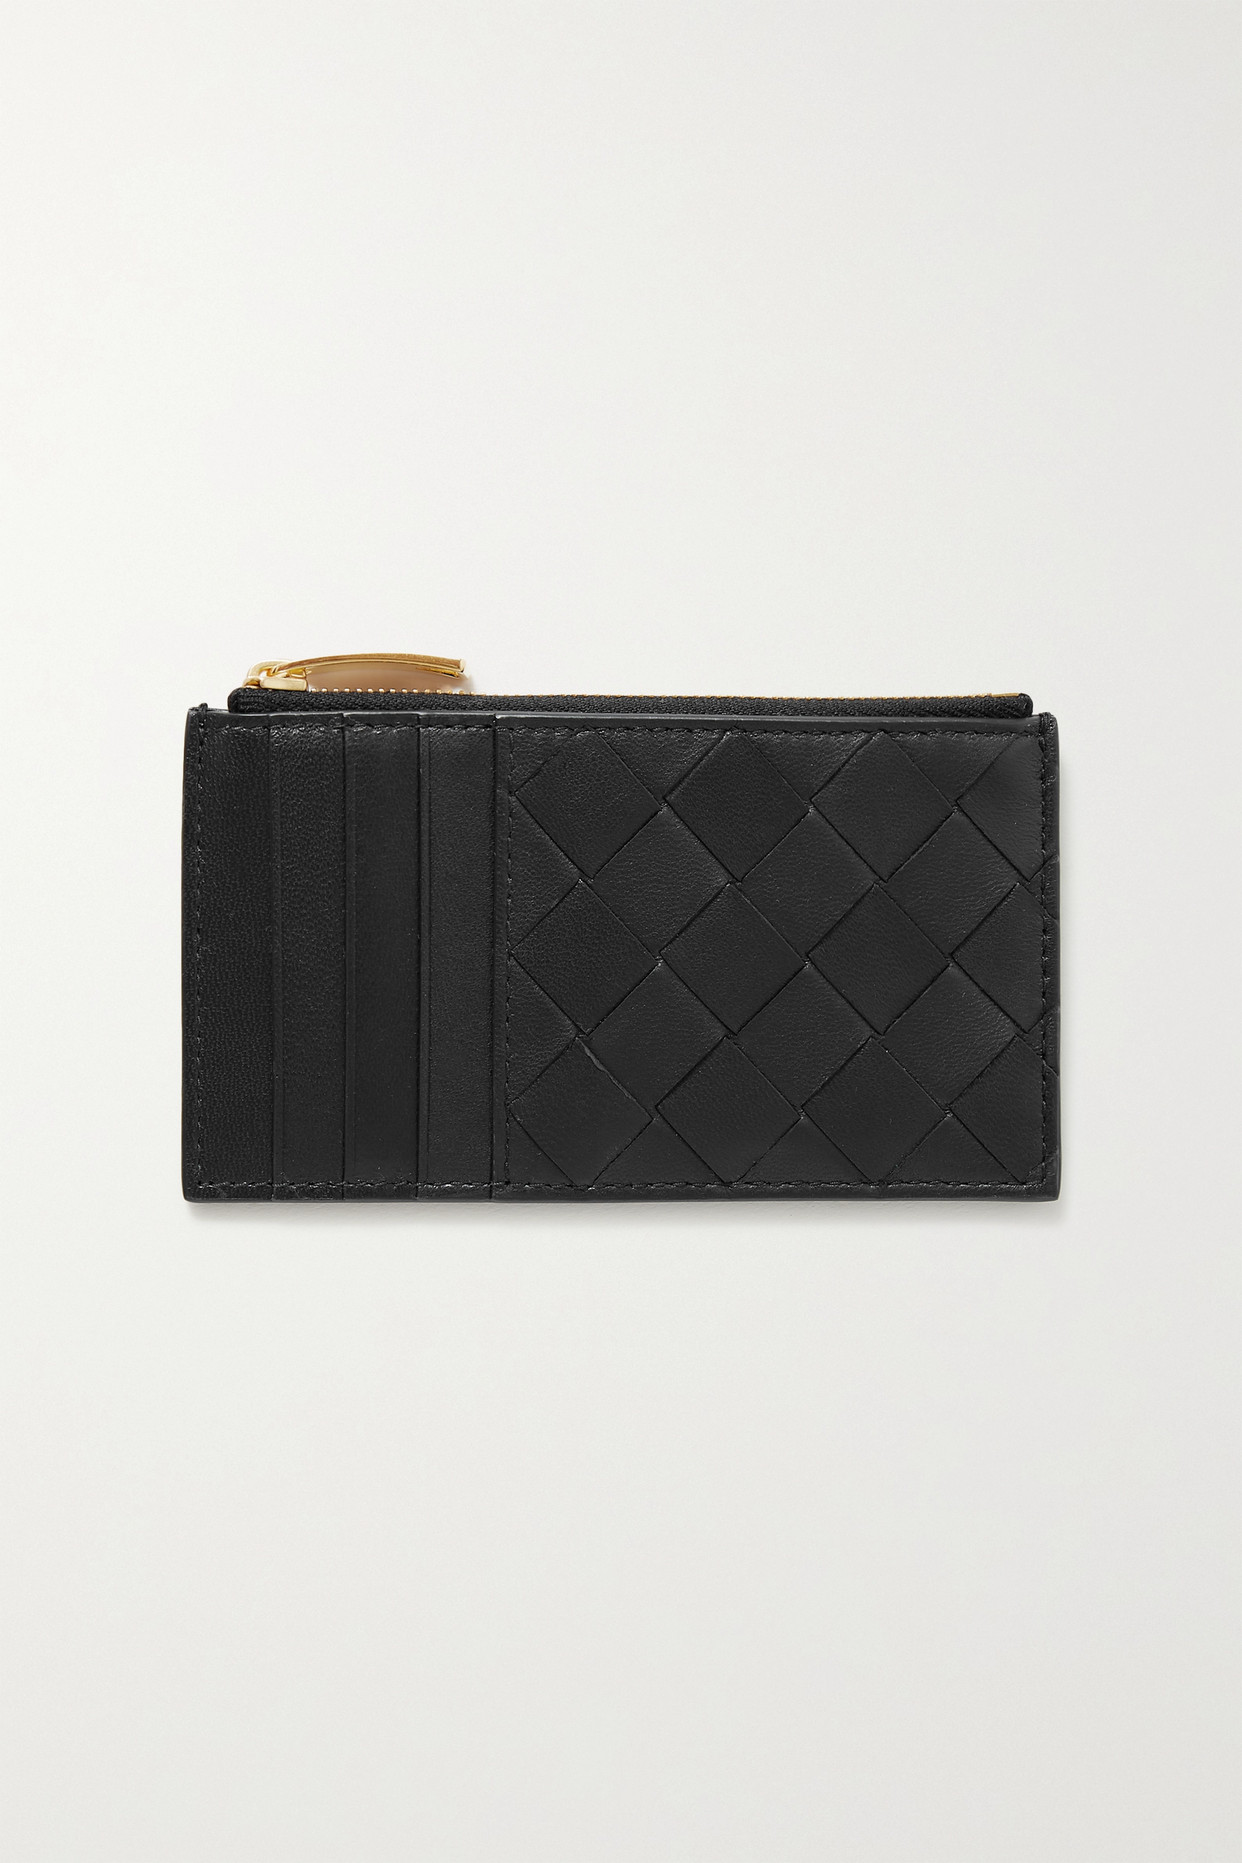 BOTTEGA VENETA - Intrecciato 皮革卡包 - 黑色 - one size